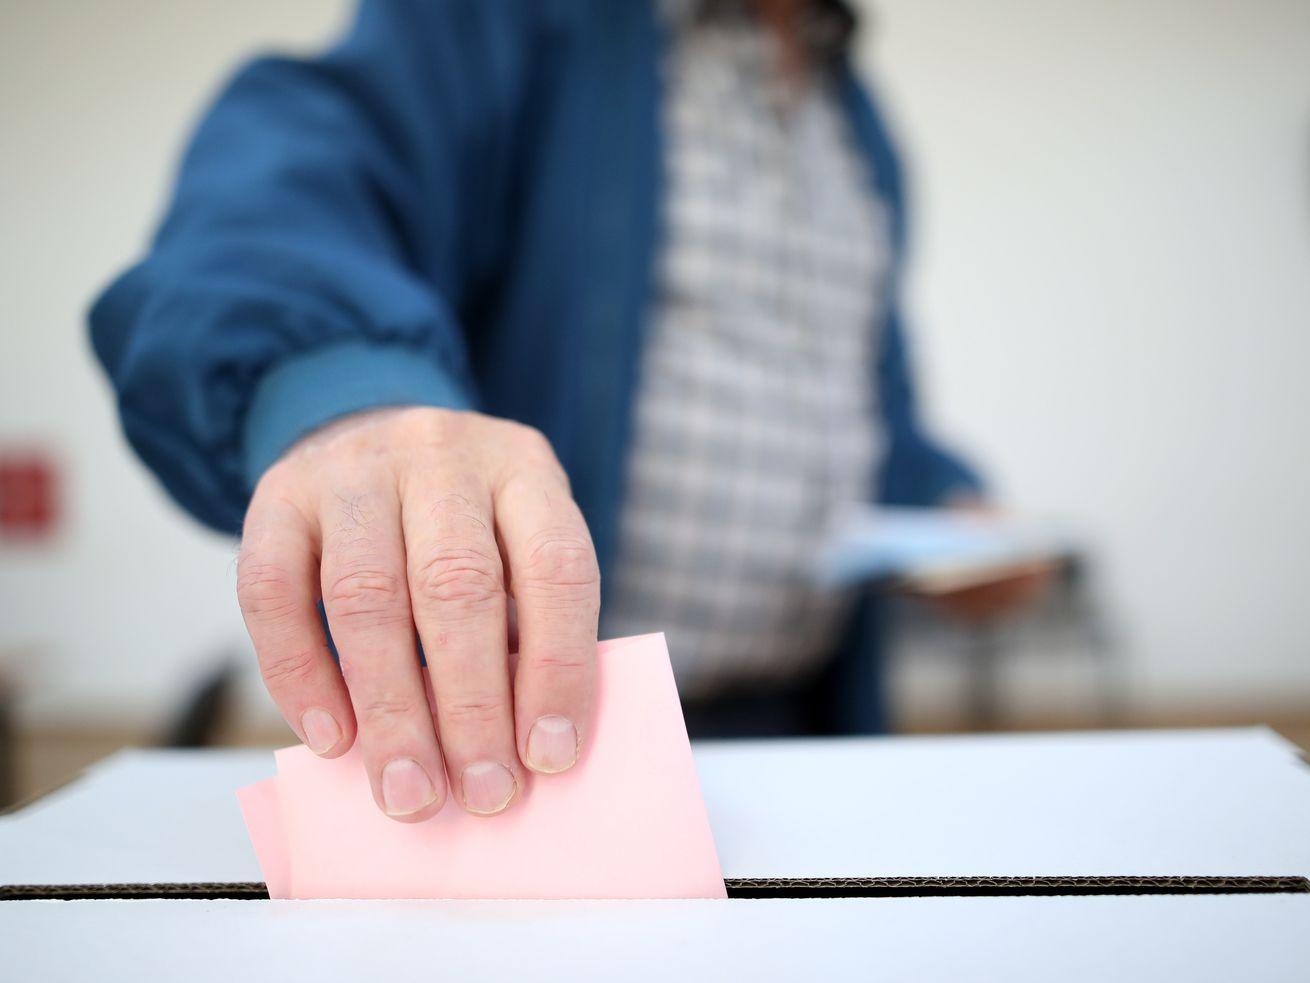 Election Day voter registration poses 'very little risk' for fraud, audit finds